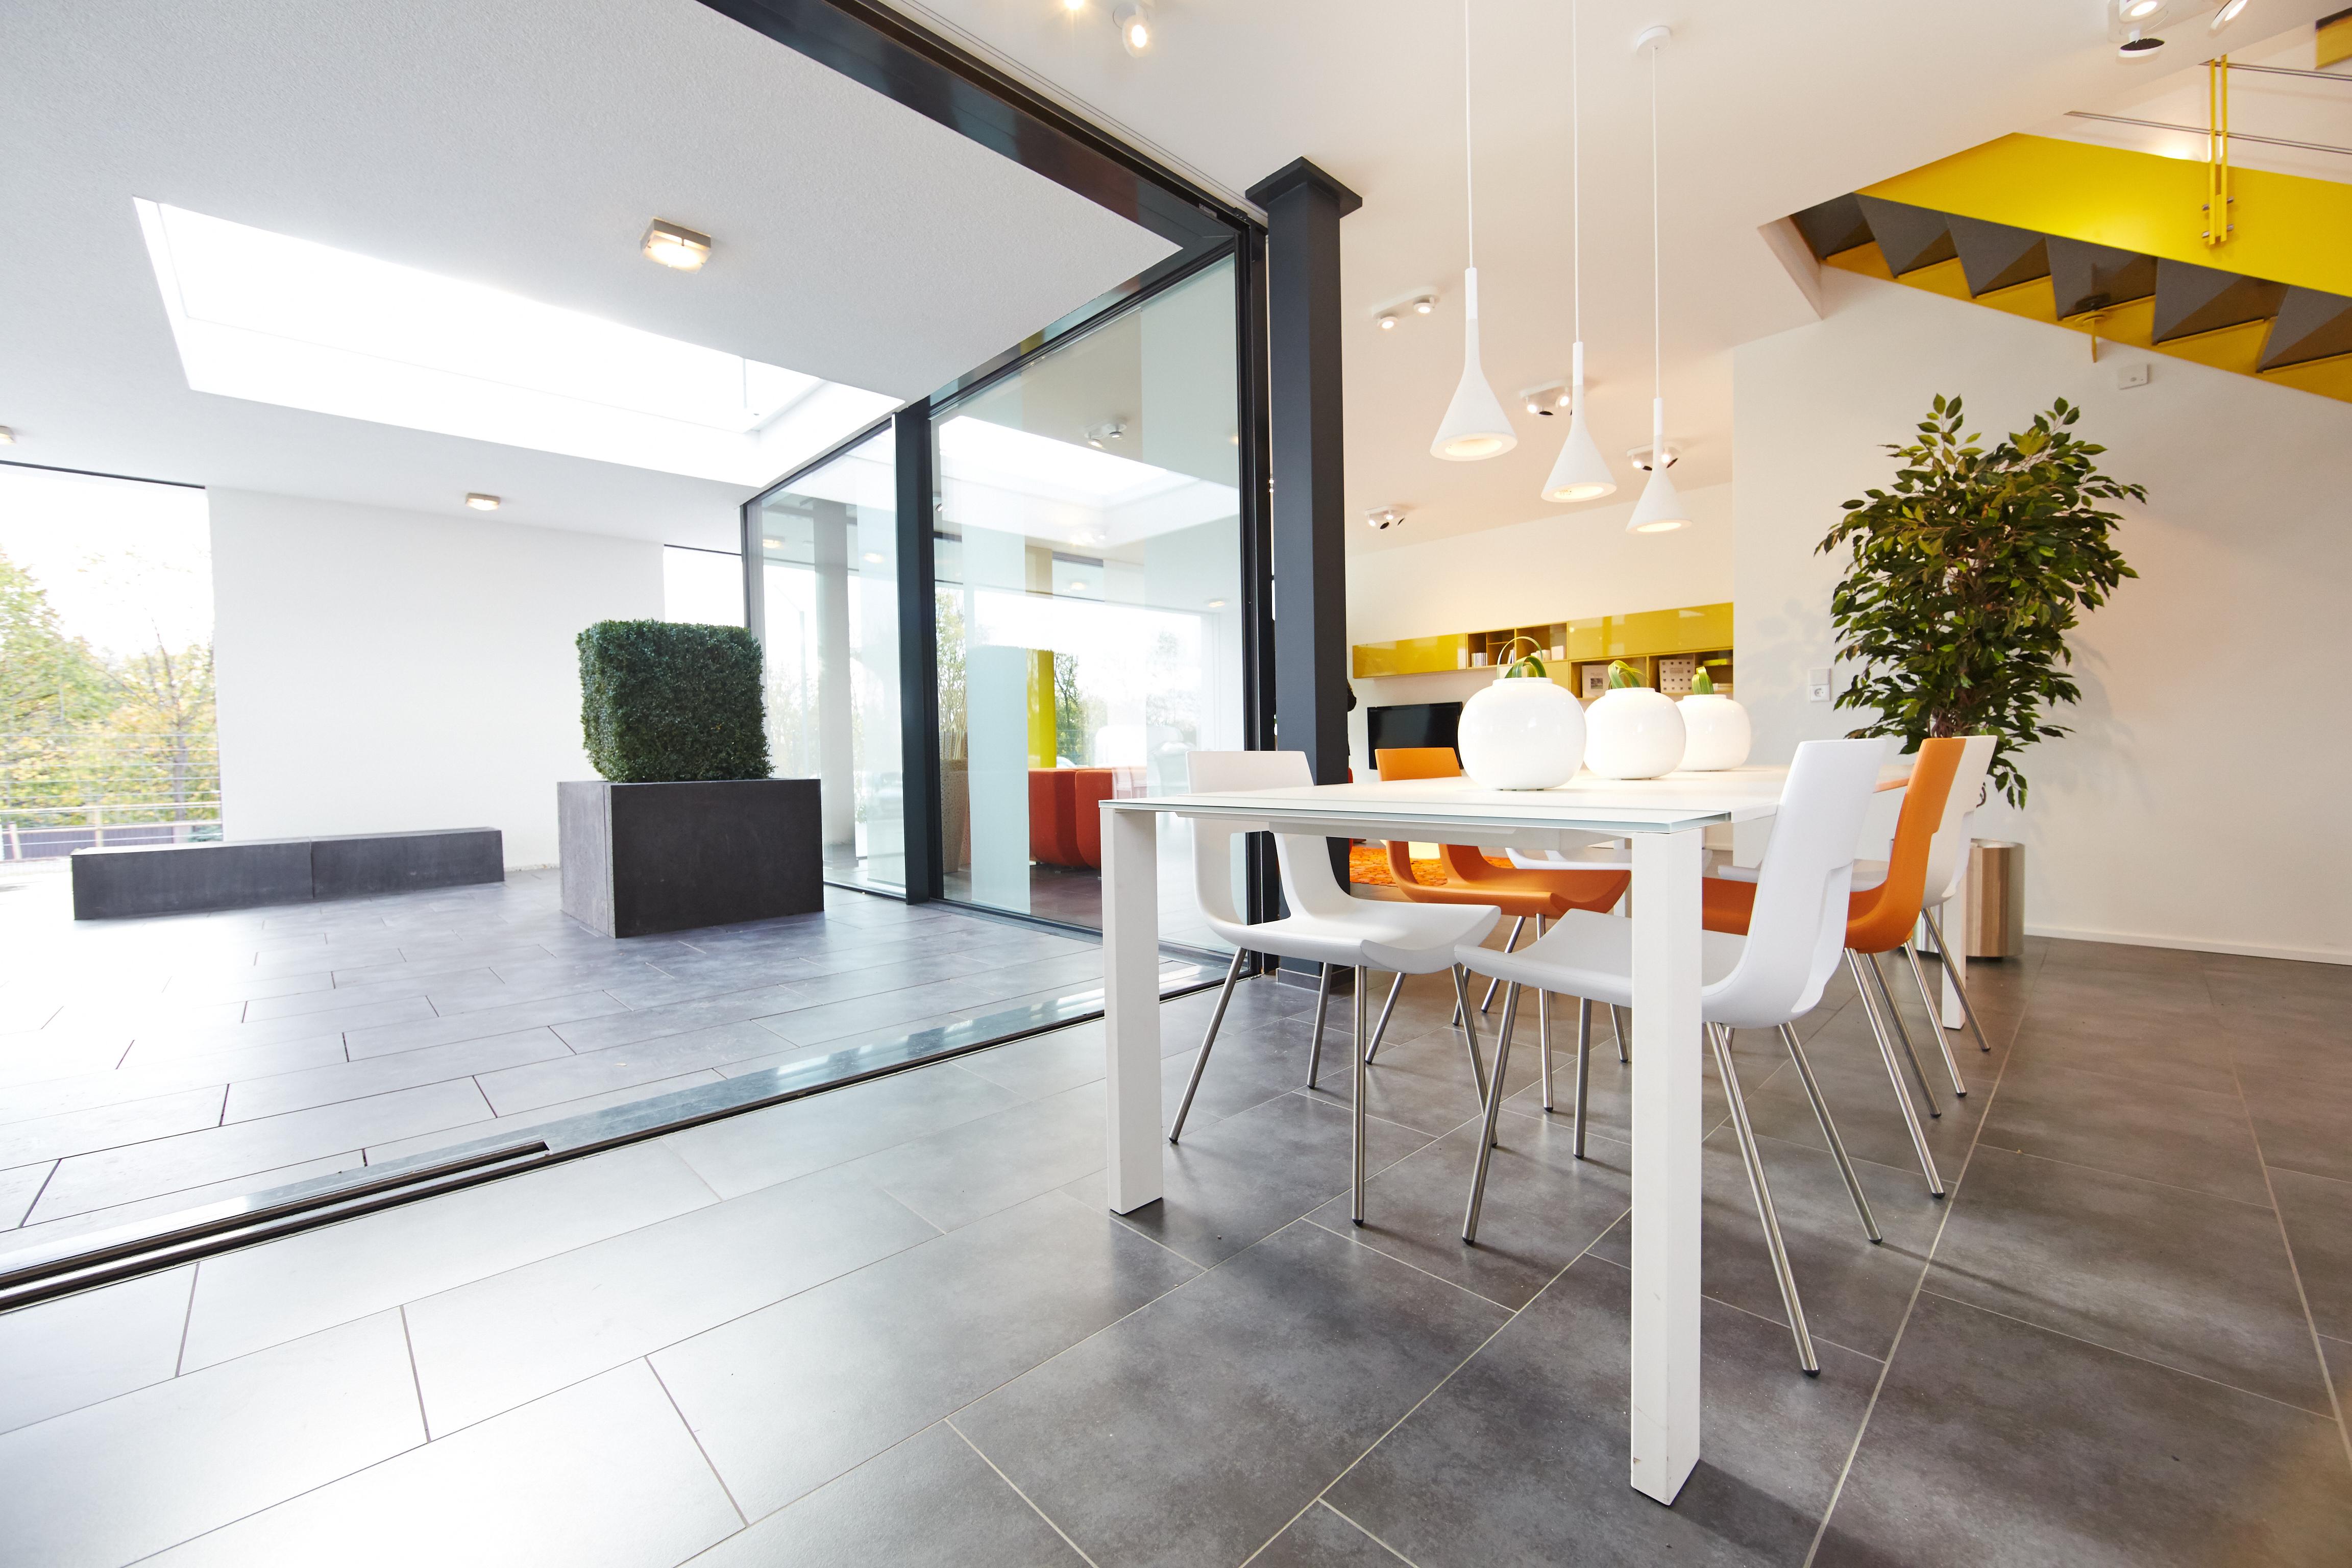 okal musterhaus ist exzellent nachhaltig gebaut okal mediacenter. Black Bedroom Furniture Sets. Home Design Ideas